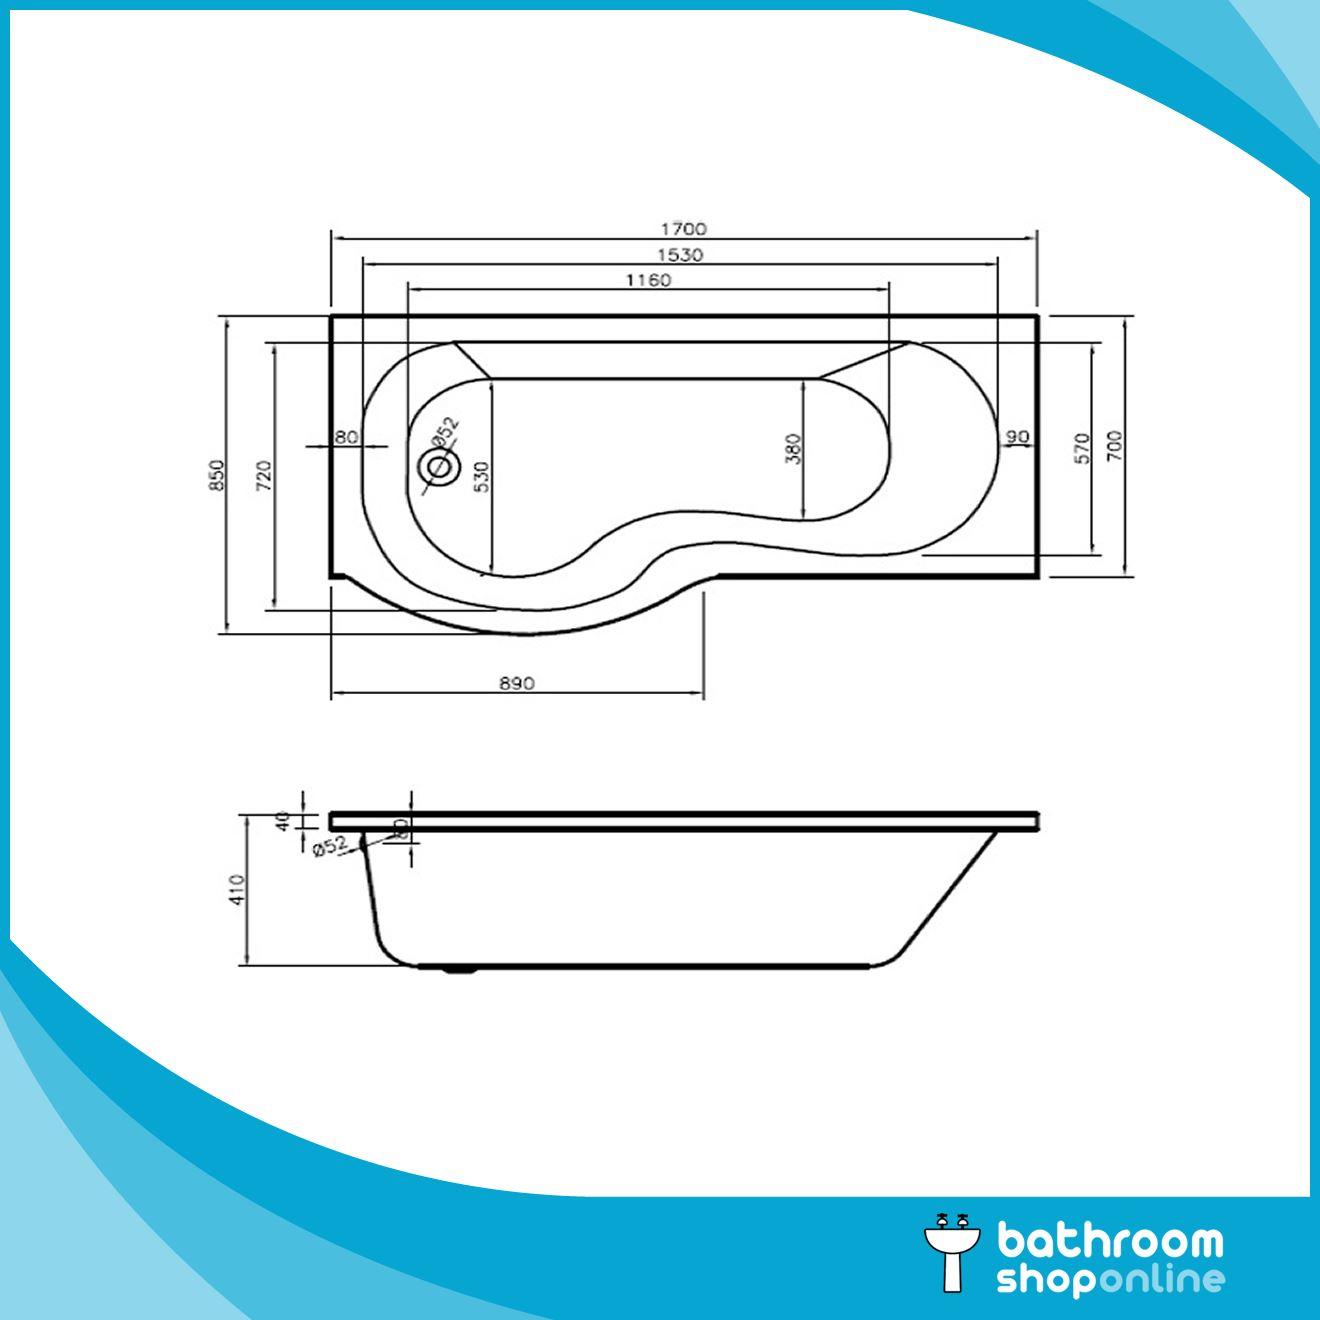 Shower Screen For P Shaped Bath P Shaped Bathroom Suite 1700mm Bath Modern Trim Basin